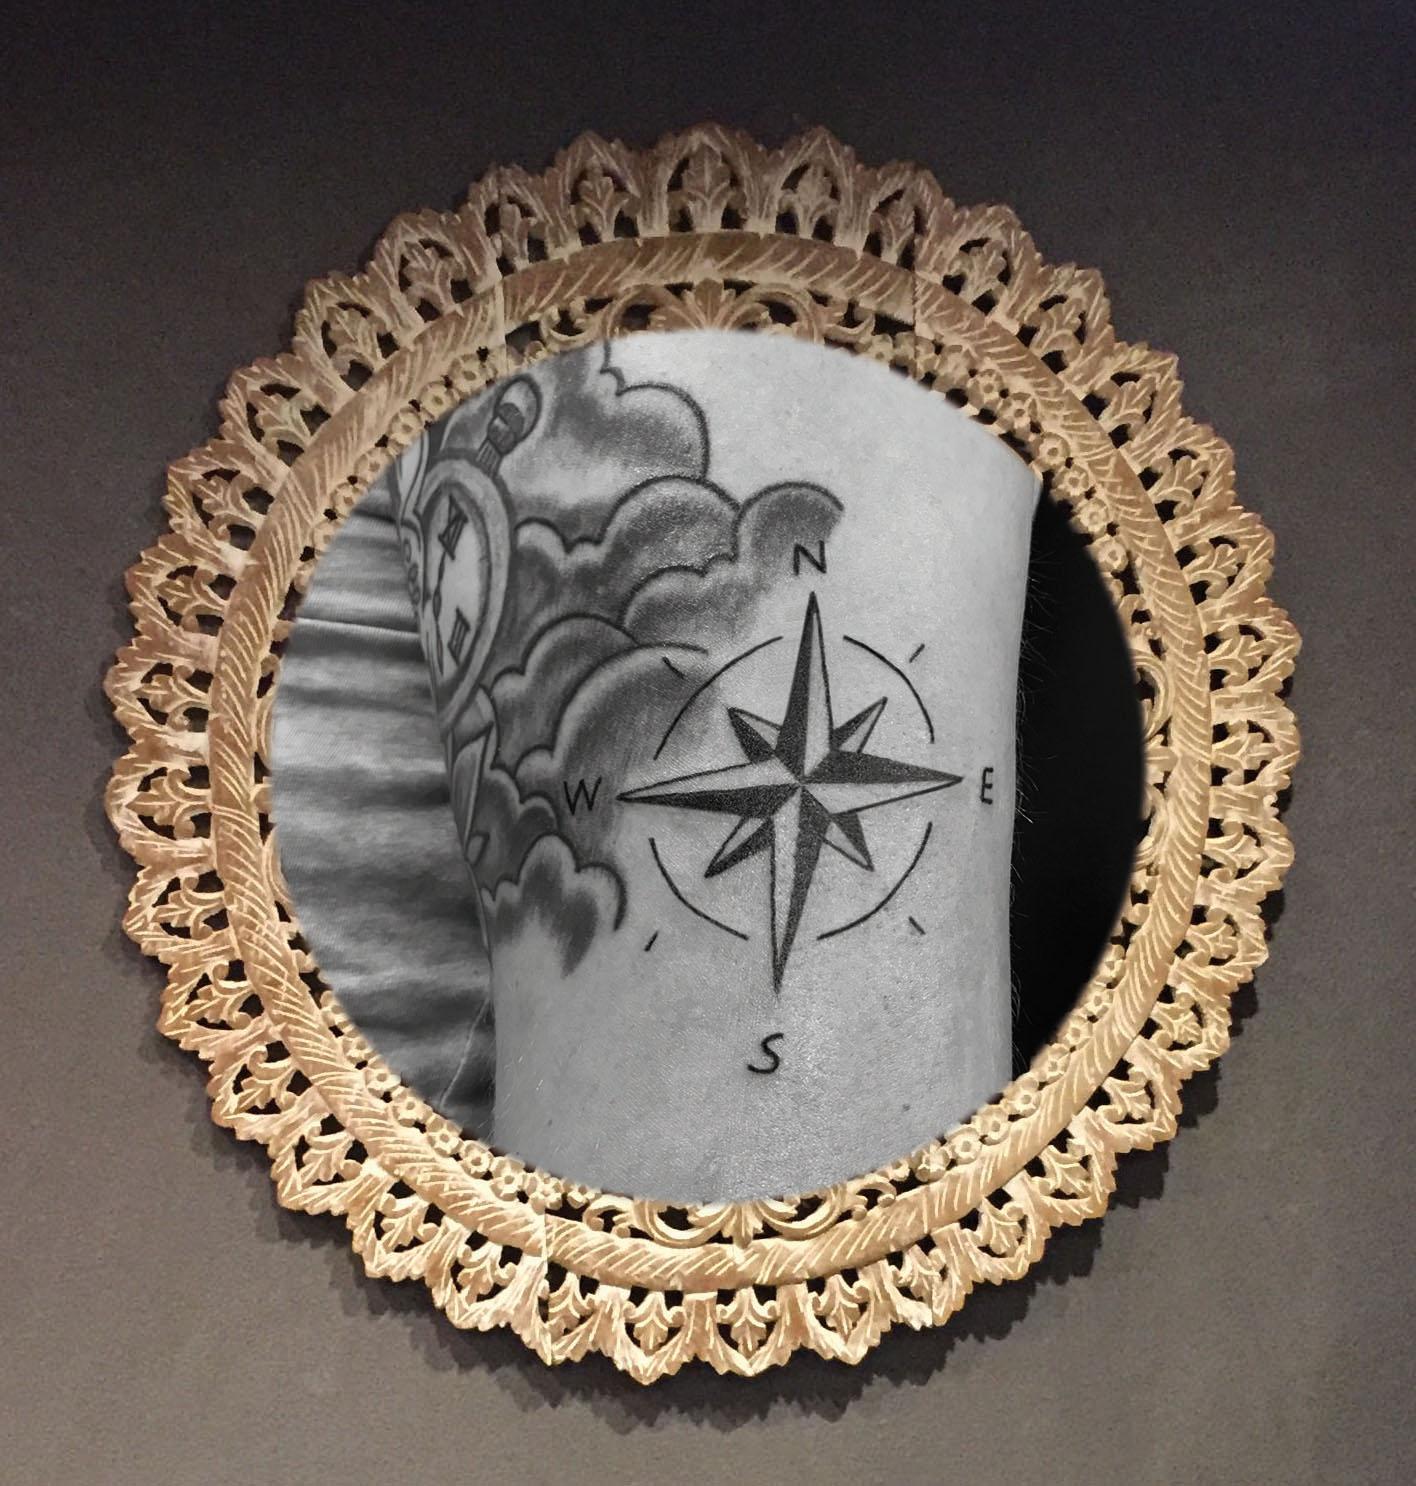 Bovenarm tatoeage